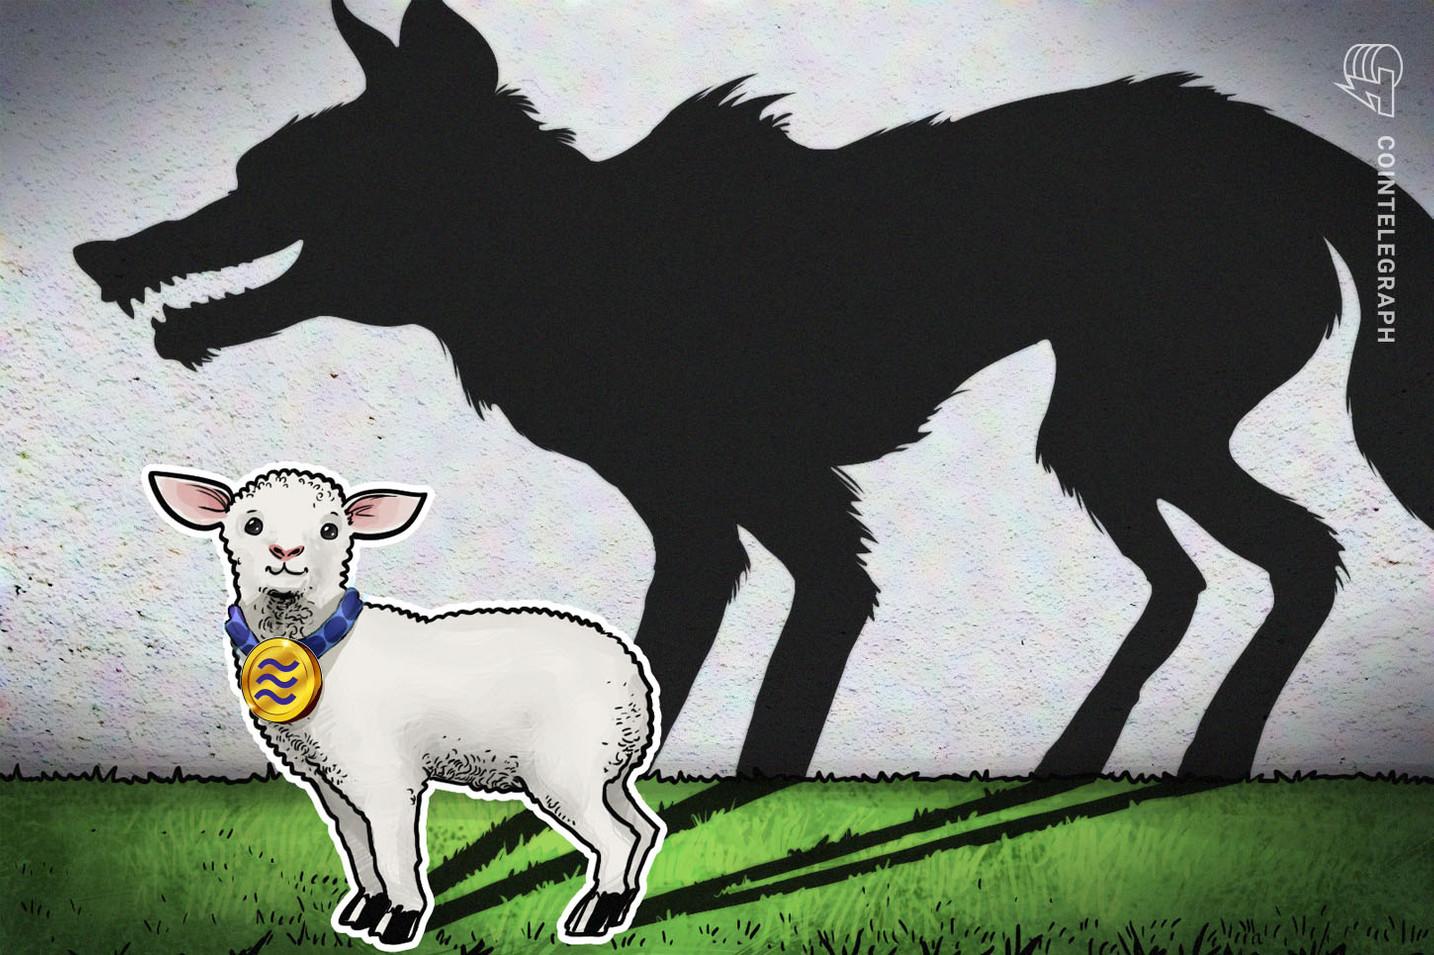 Senator Brown on Libra: 'A Recipe for More Corporate Power Over Markets'